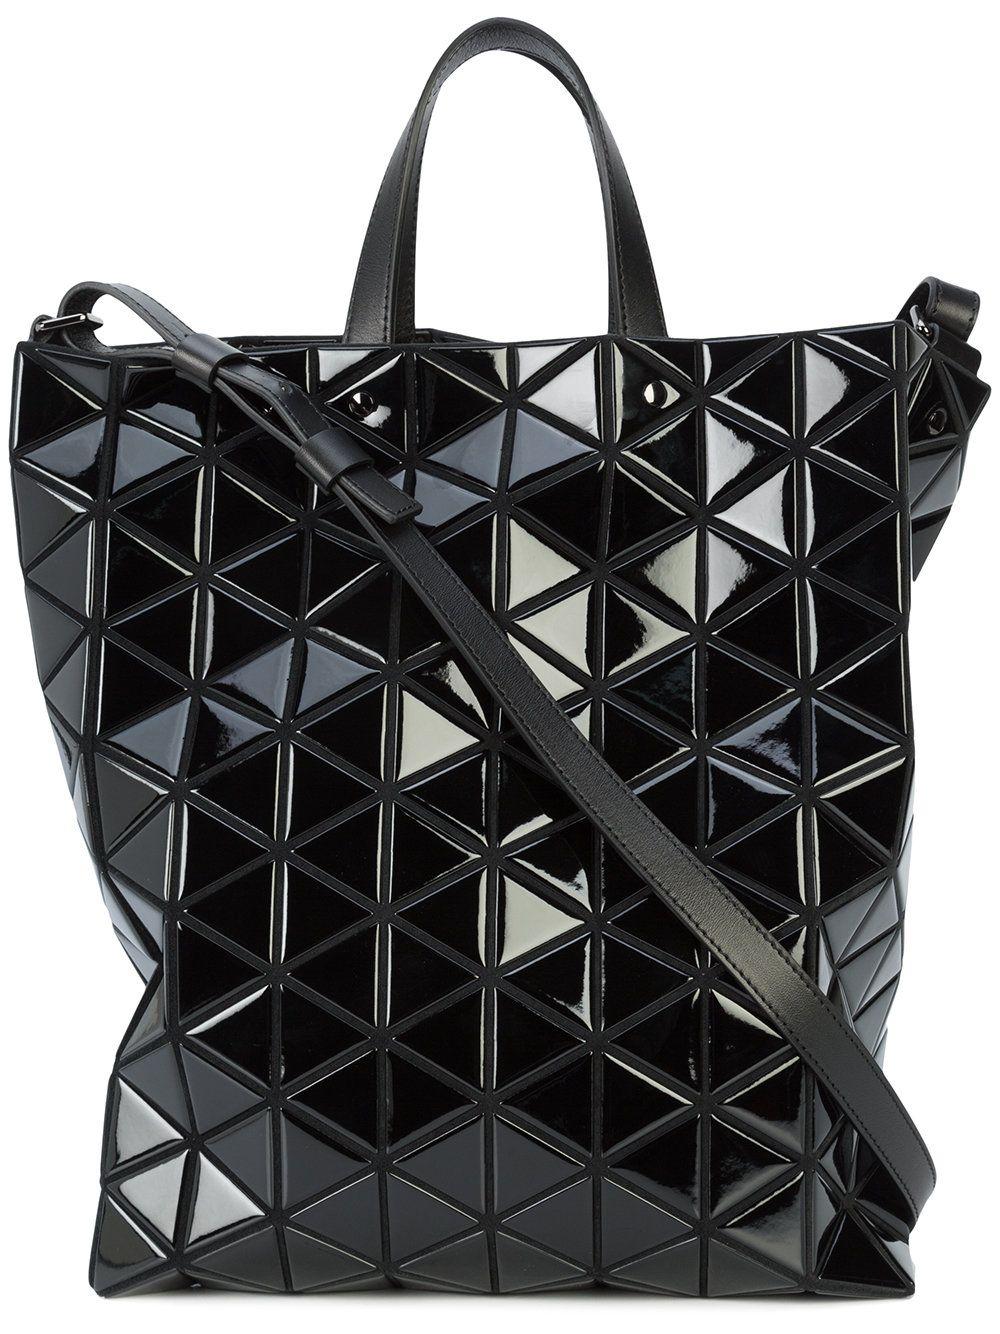 58be5f1a91 BAO BAO ISSEY MIYAKE .  baobaoisseymiyake  bags  leather  hand bags  tote